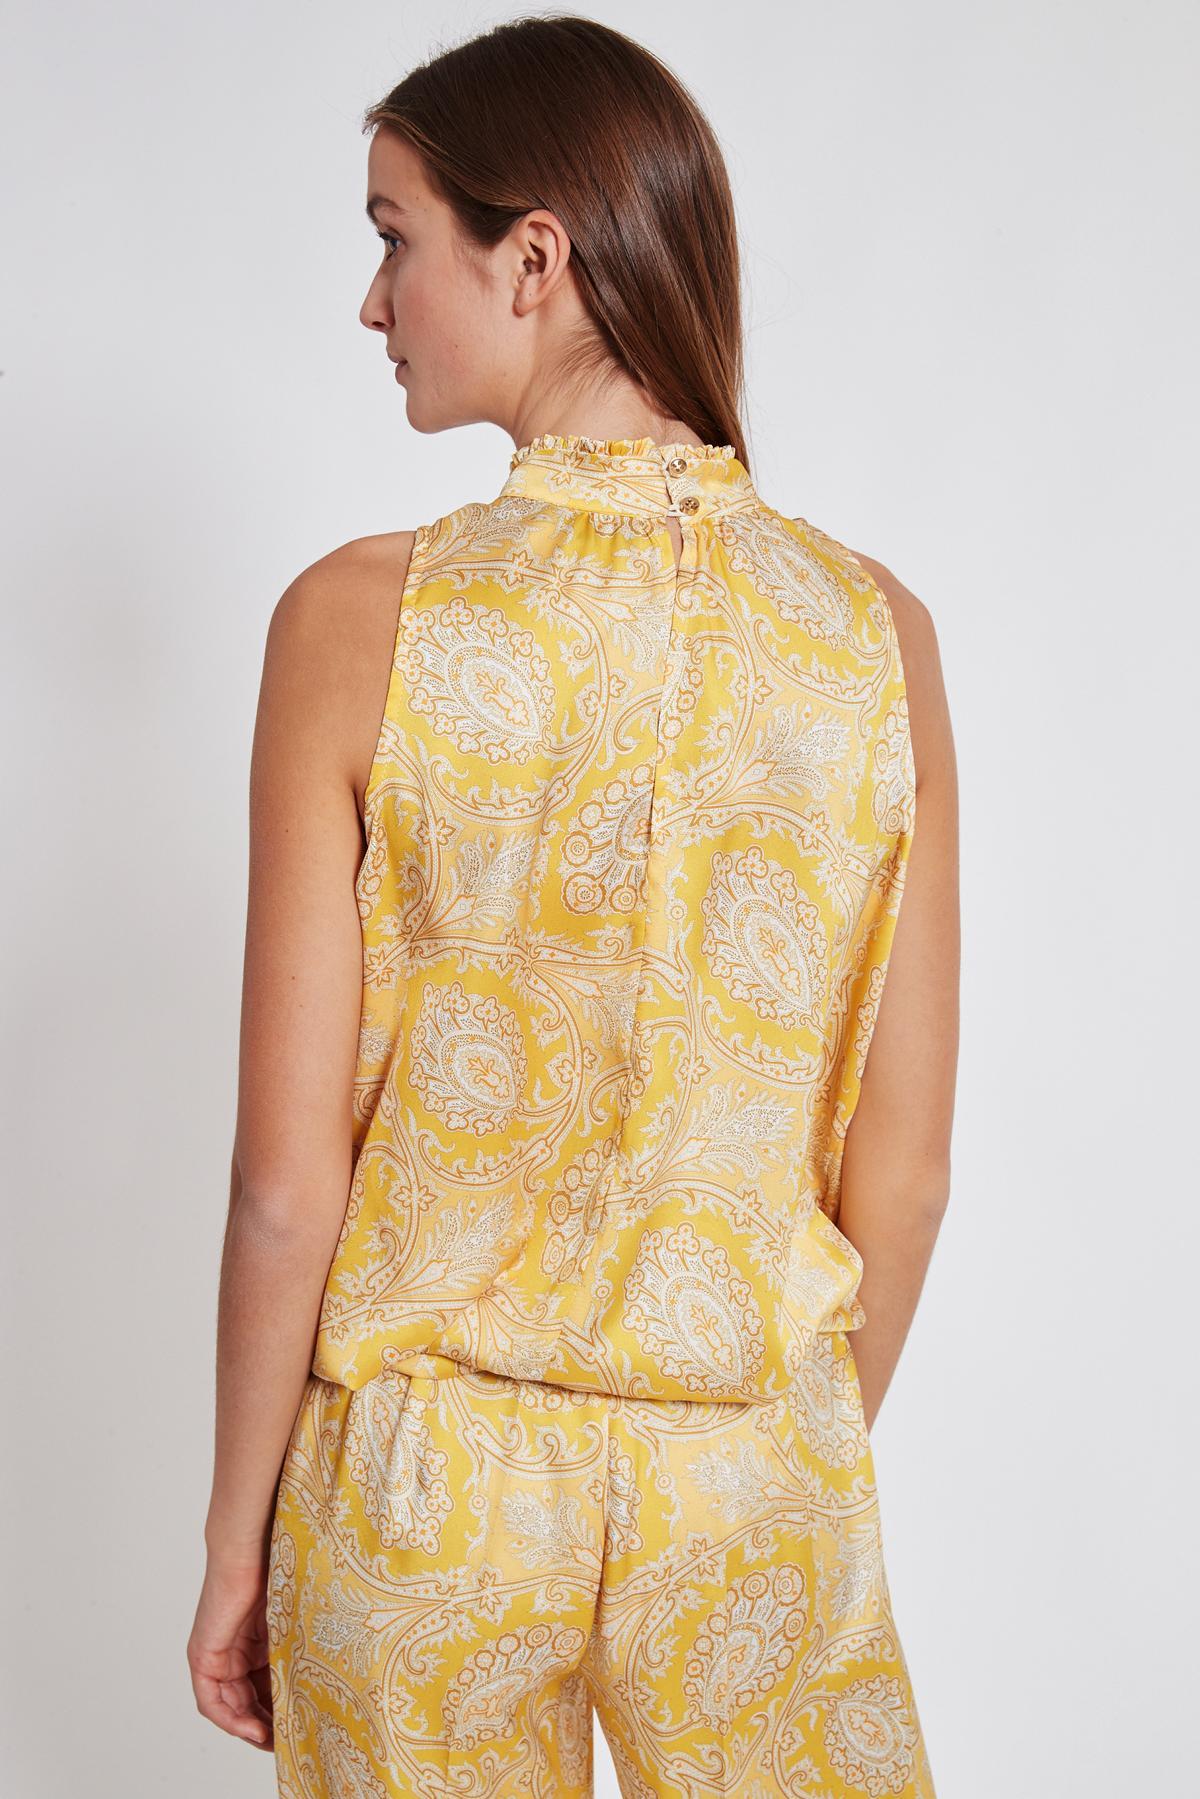 Rückansicht von Ana Alcazar Paisley Top Tefsinke Gelb  angezogen an Model